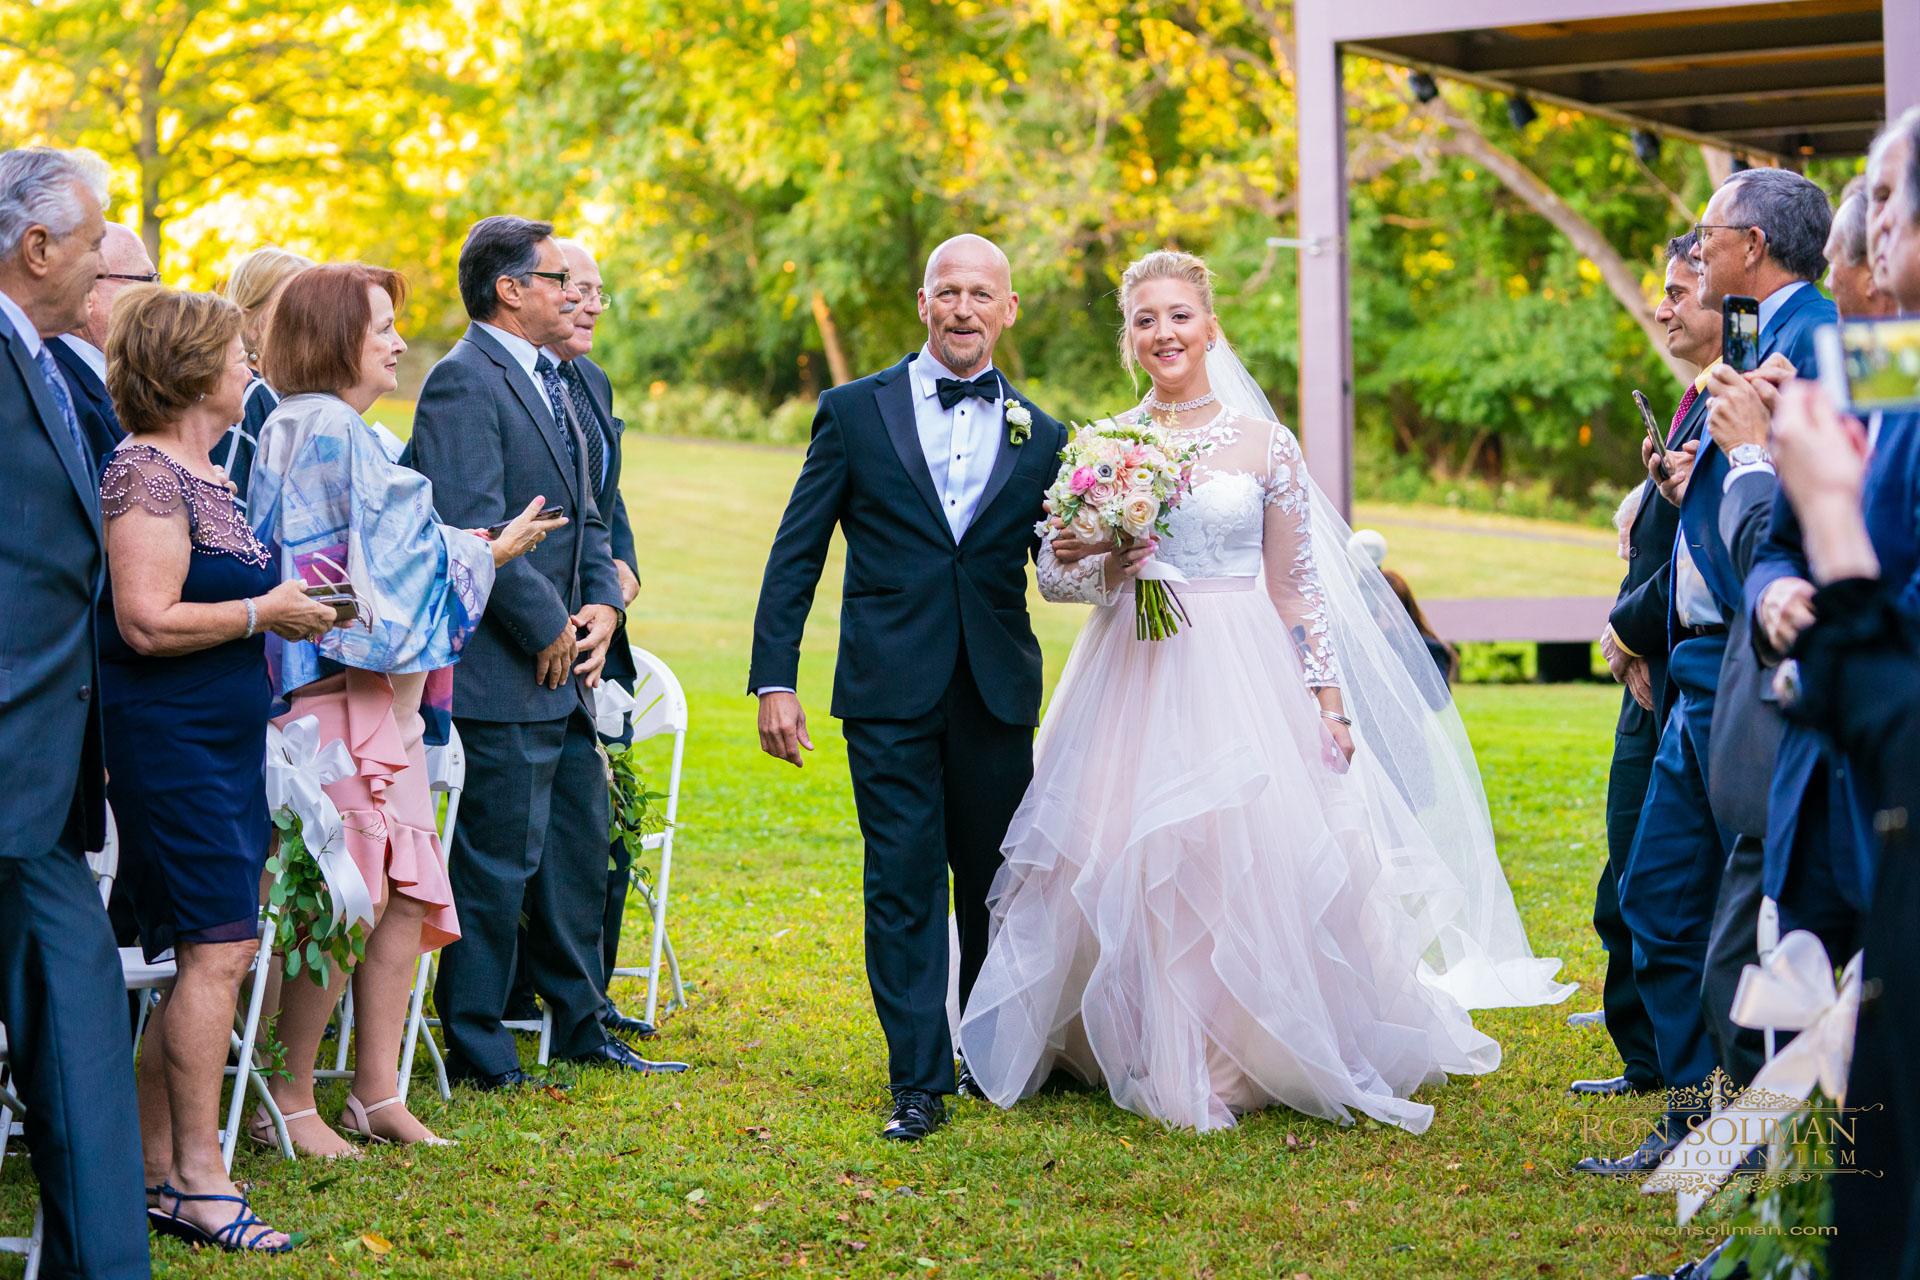 ALVERTHORPE MANOR HOUSE WEDDING 22